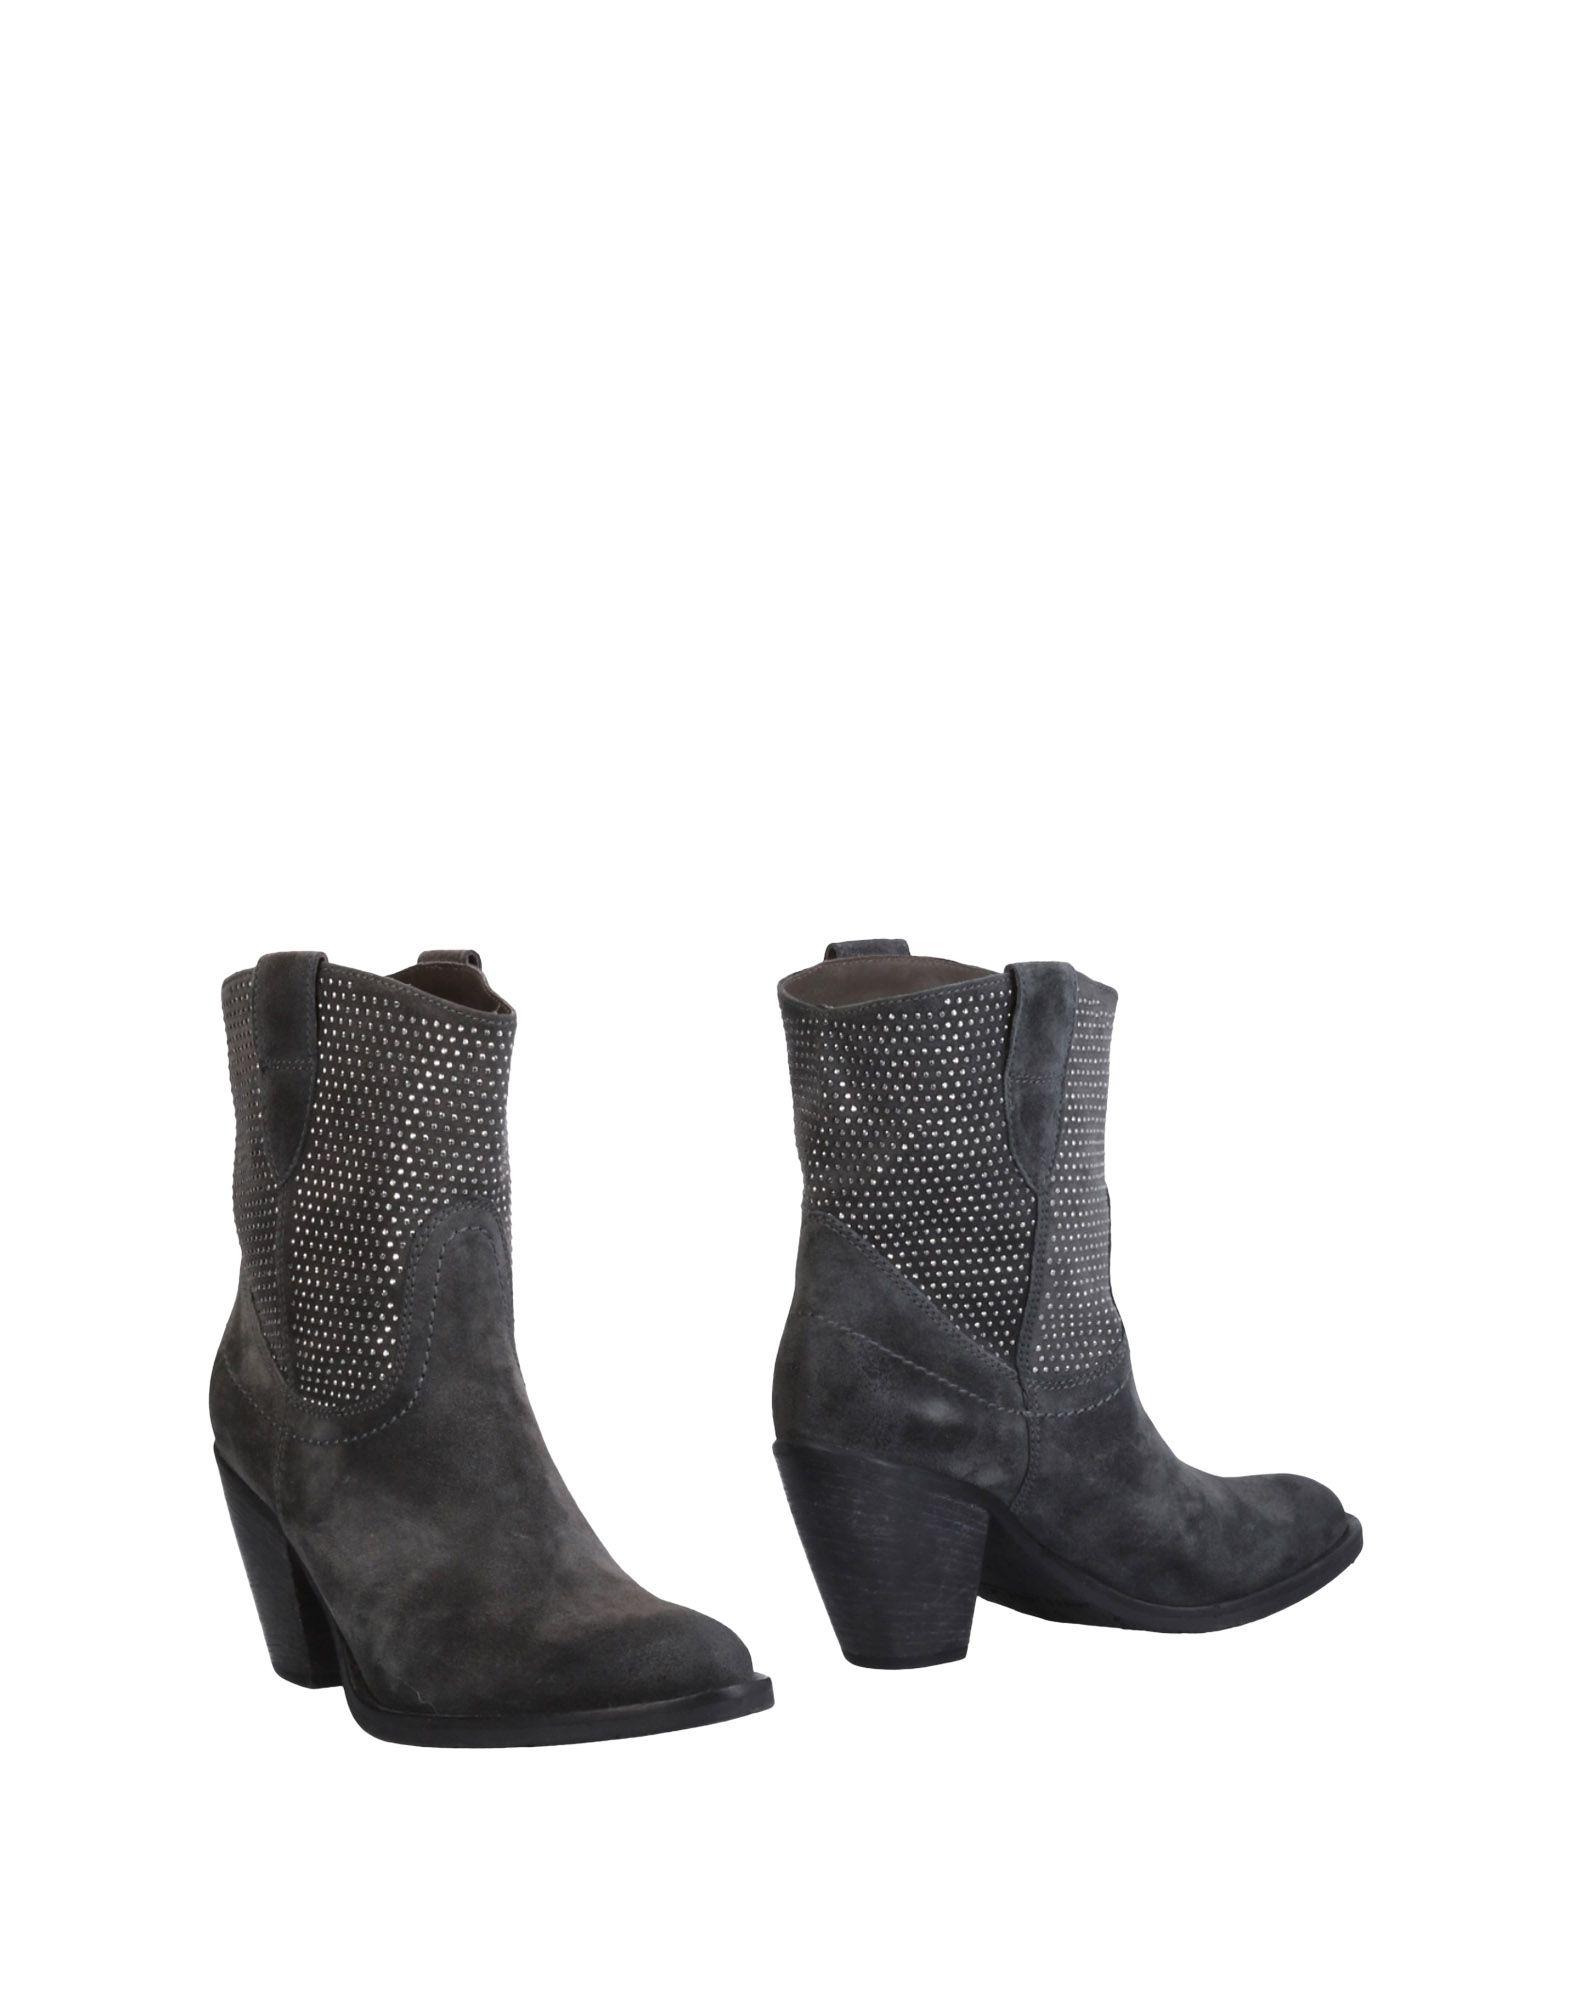 Stilvolle Janet billige Schuhe Janet & Janet Stilvolle Stiefelette Damen  11461681JM 513517